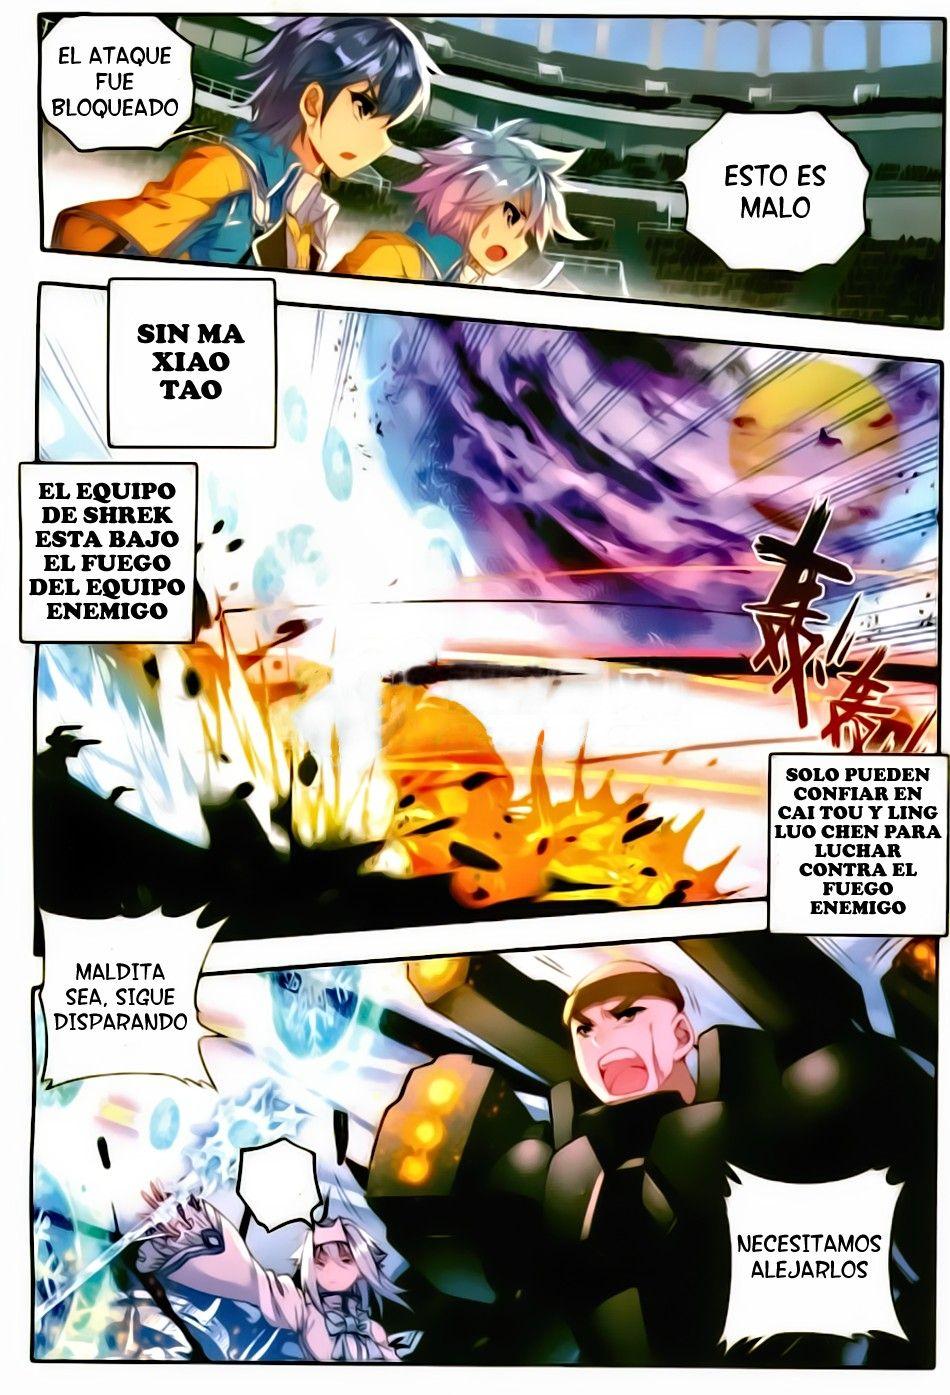 http://c5.ninemanga.com/es_manga/pic2/33/16417/515164/59186584039c18248c1c4244e7305050.jpg Page 9